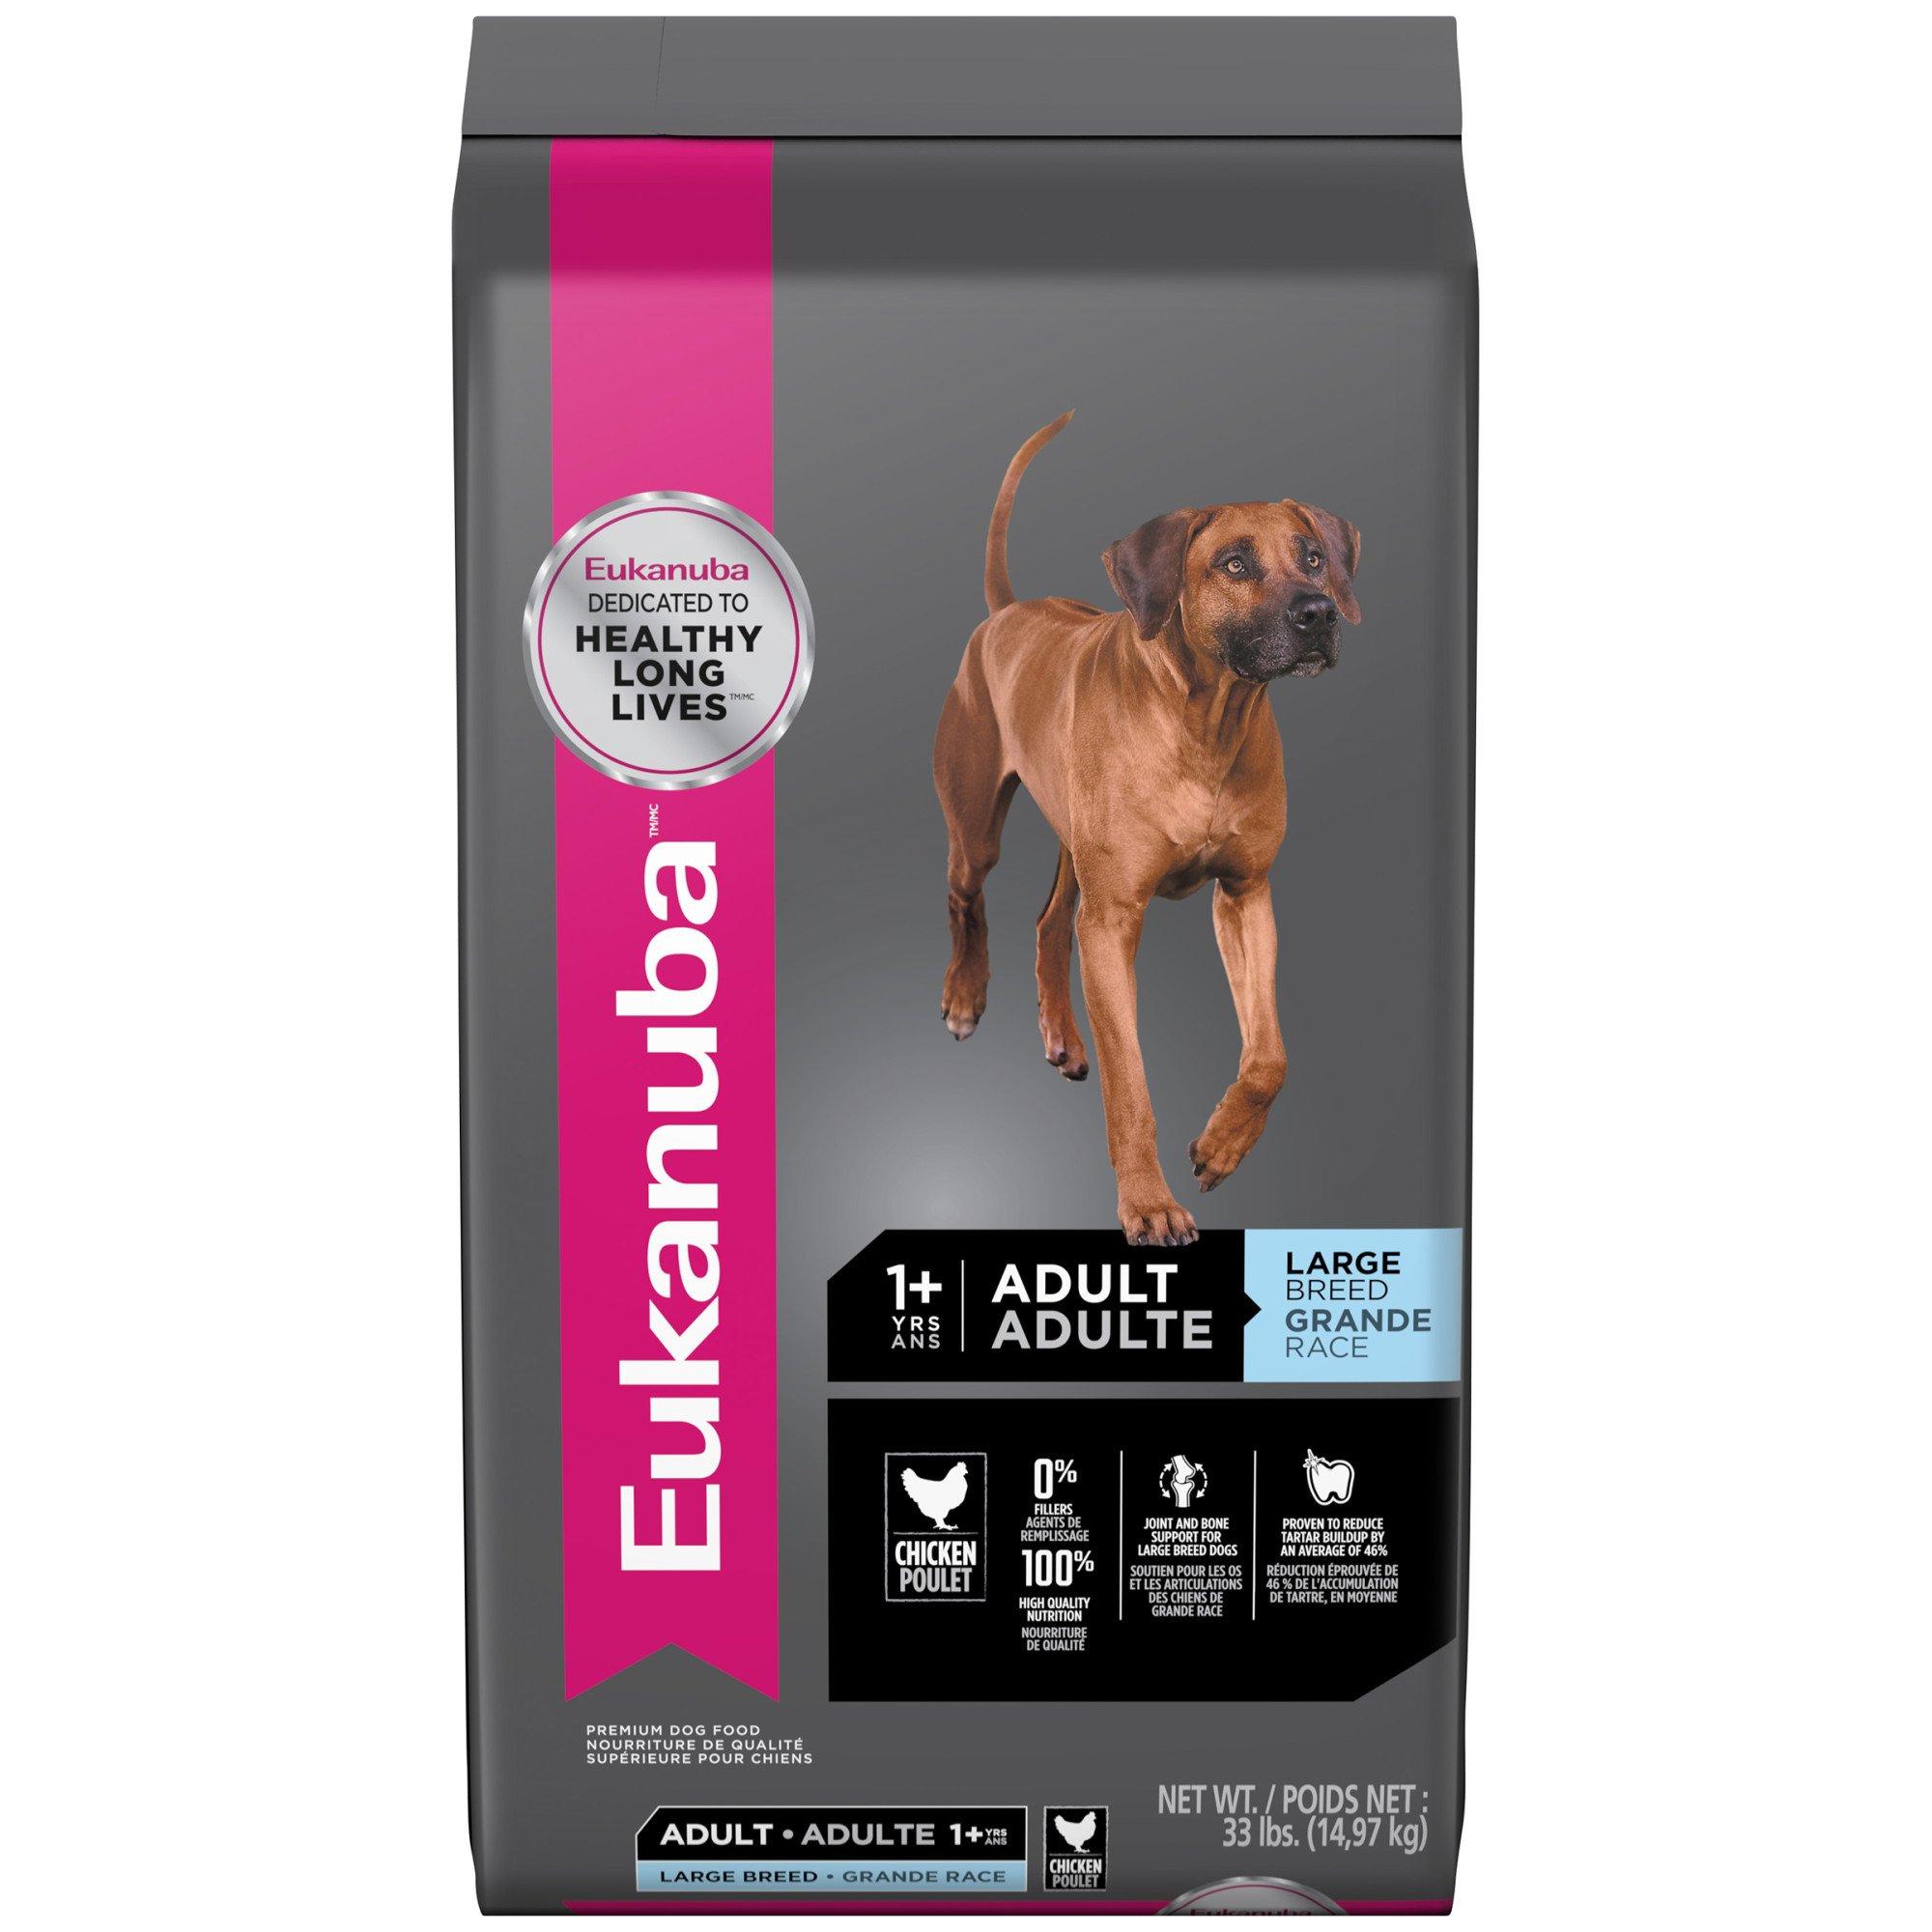 Eukanuba large breed dog food coupons